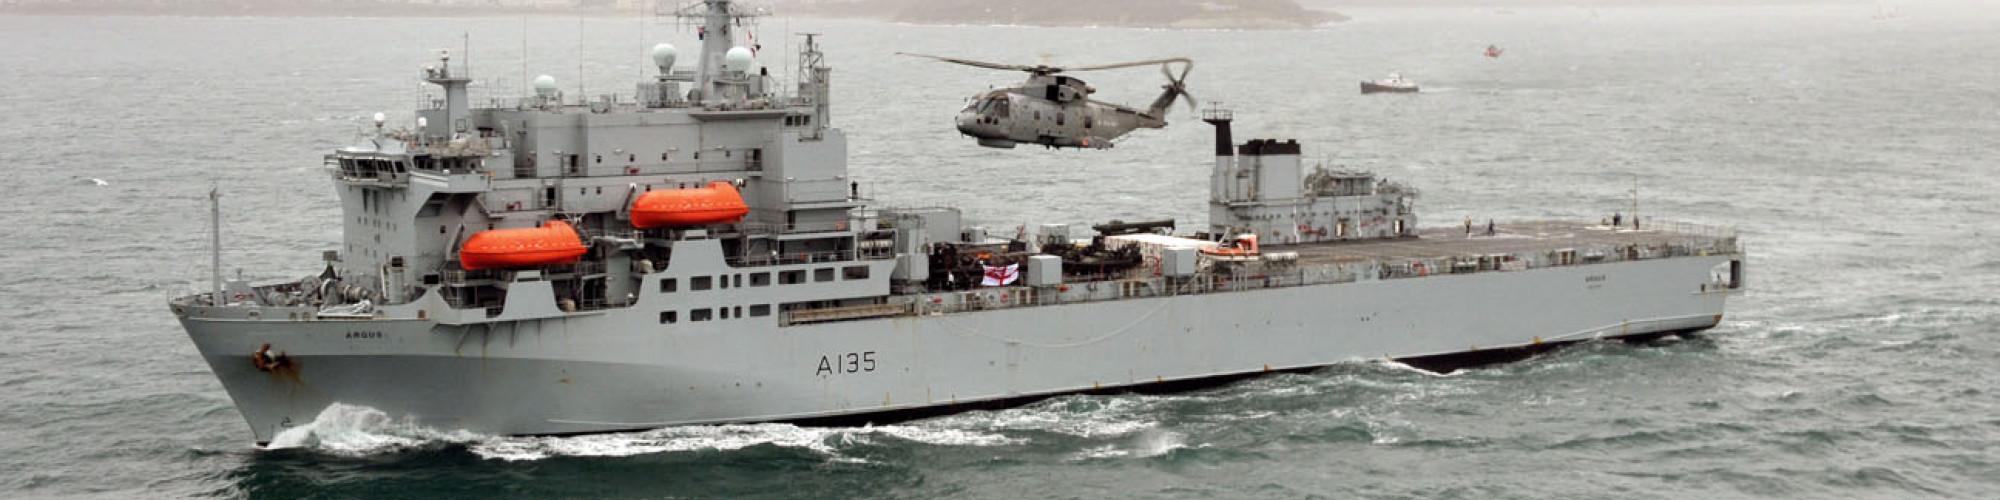 Royal Navy Medical Branch